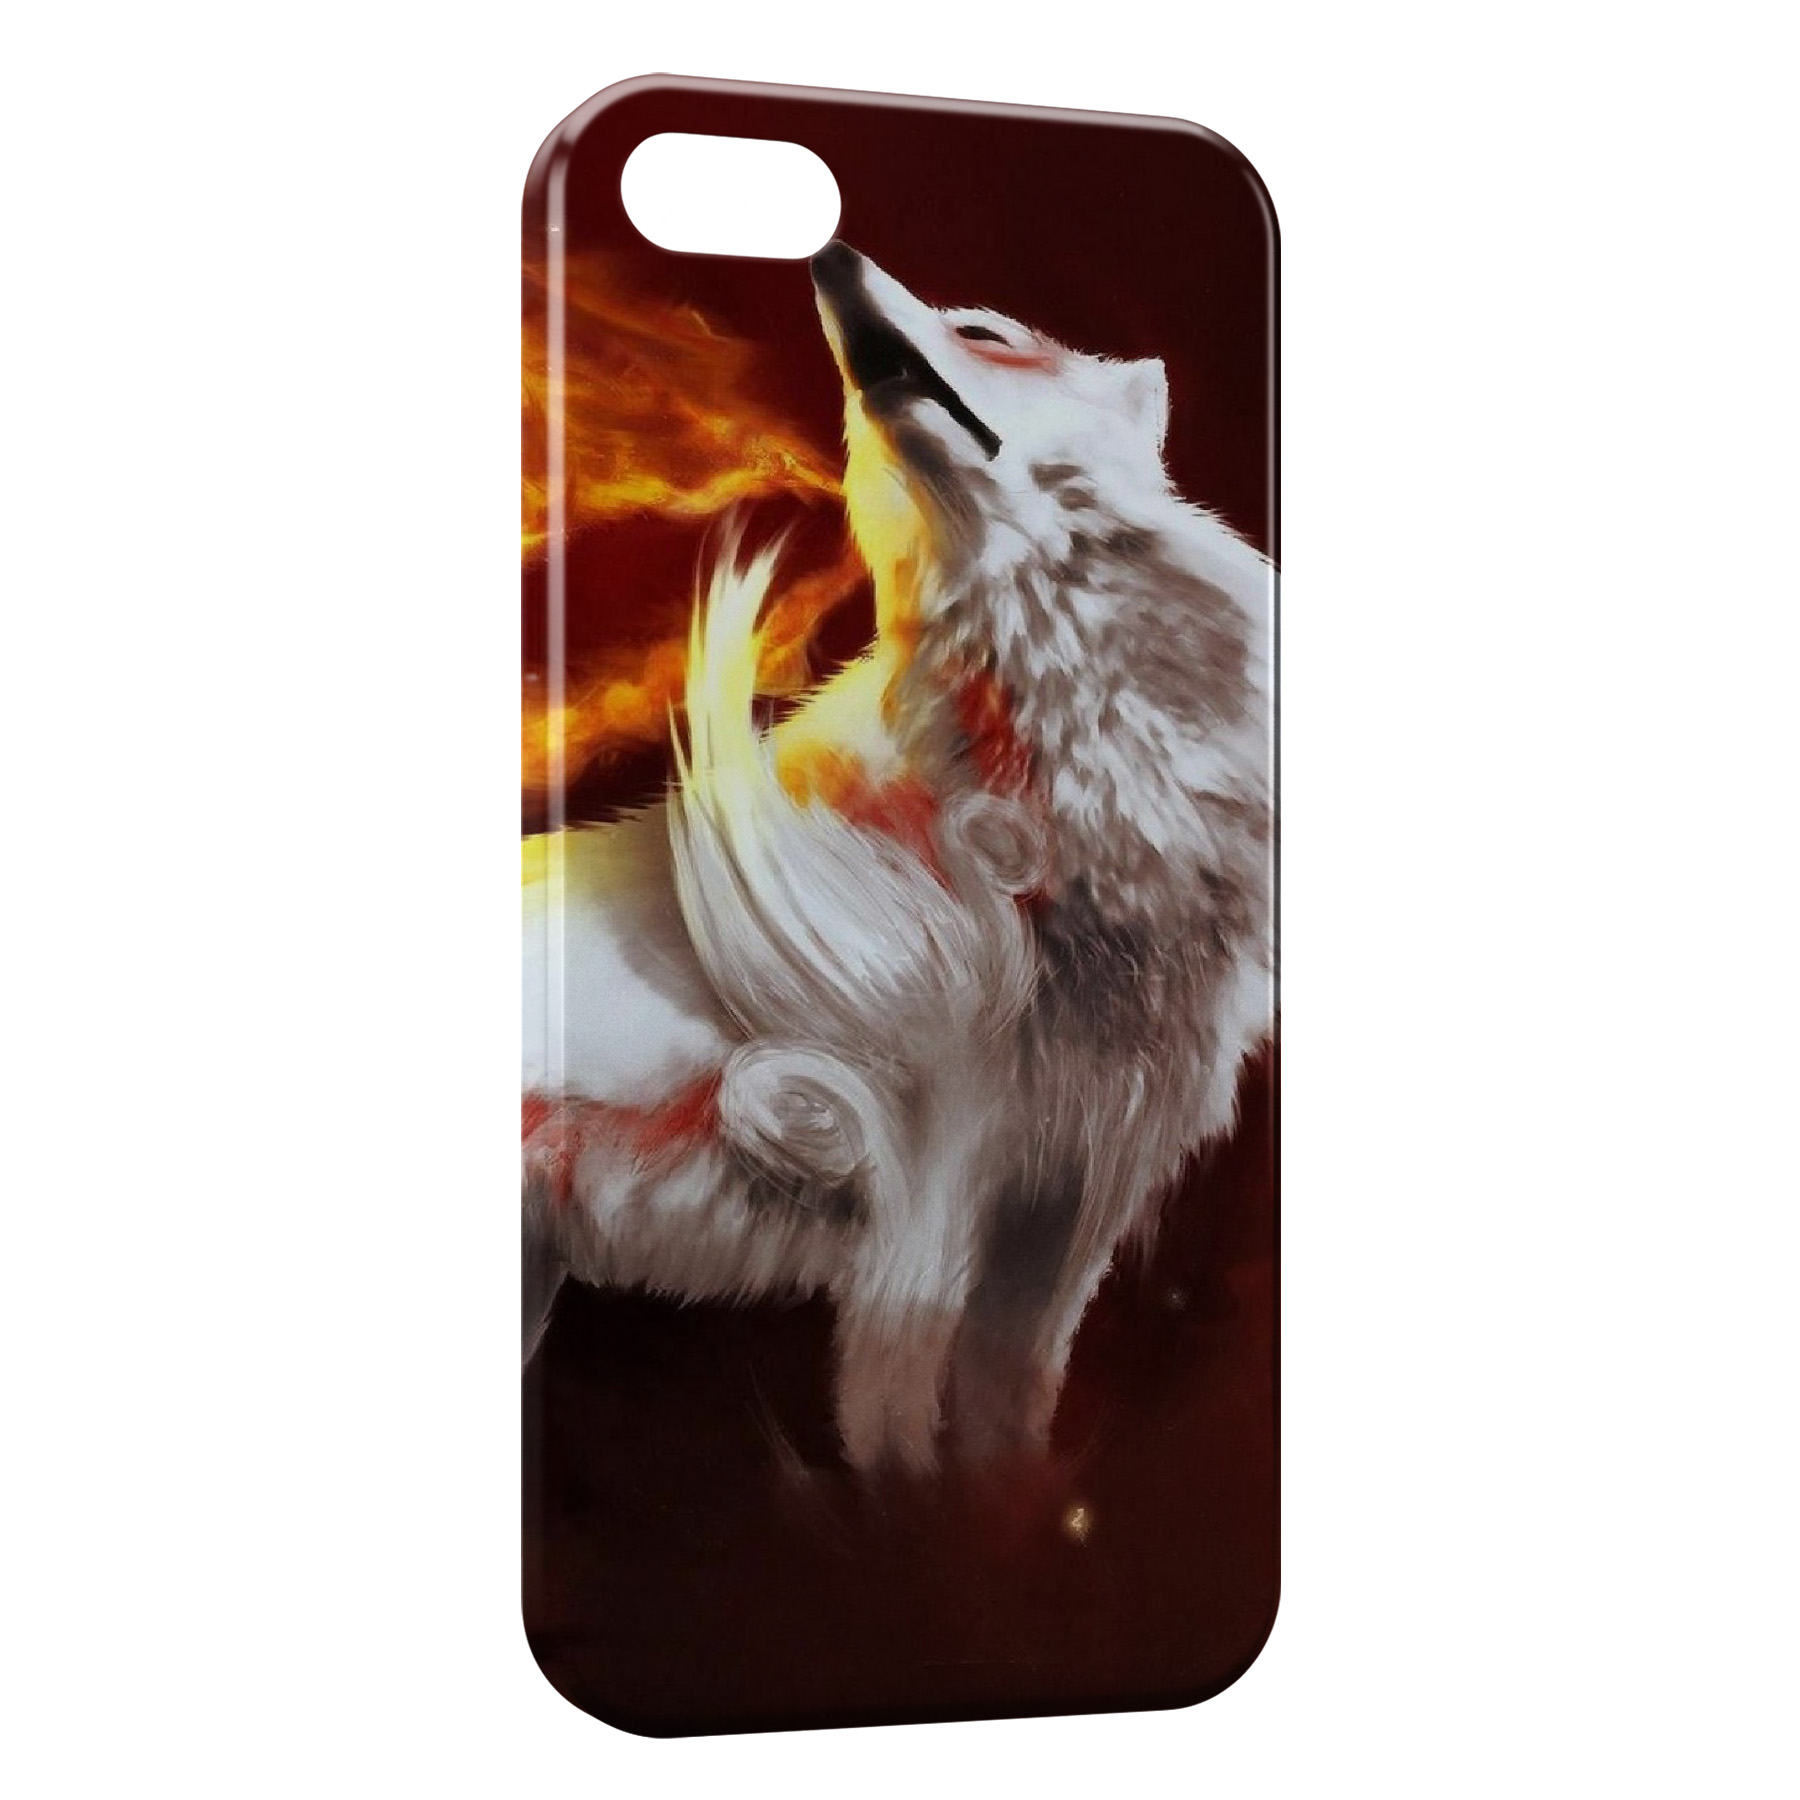 Coque iPhone 6 Plus 6S Plus Loup Fire